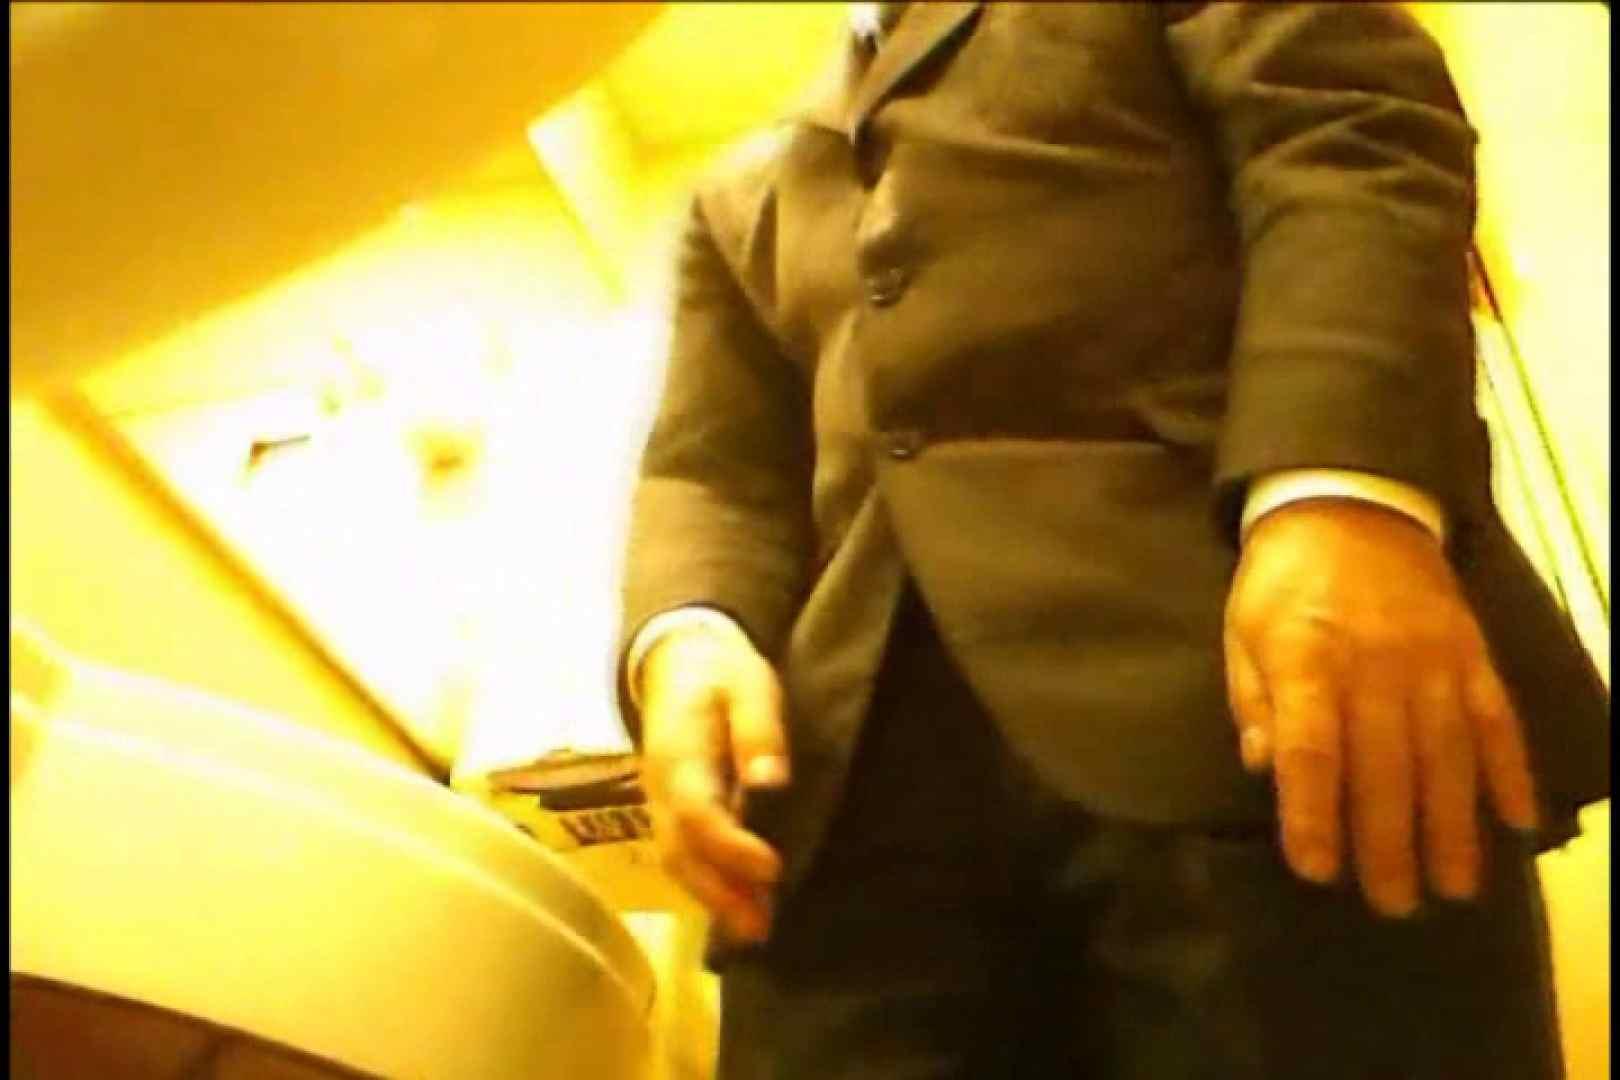 Gボーイ初投稿!掴み取りさんの洗面所覗き!in新幹線!VOL.01 スーツボーイズ | 男天国  103pic 29